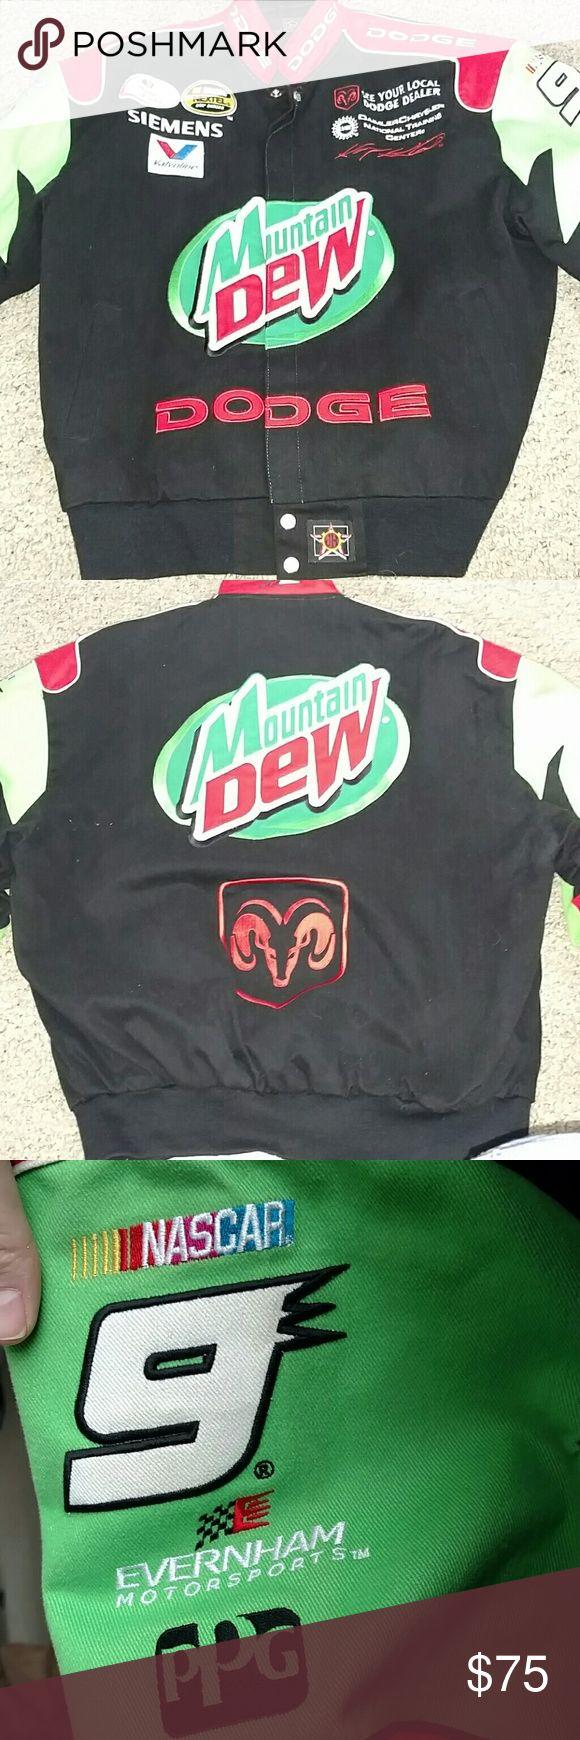 Kasey Kahne NASCAR jacket Kasey Kahne NASCAR jacket. Excellent condition! Jackets & Coats